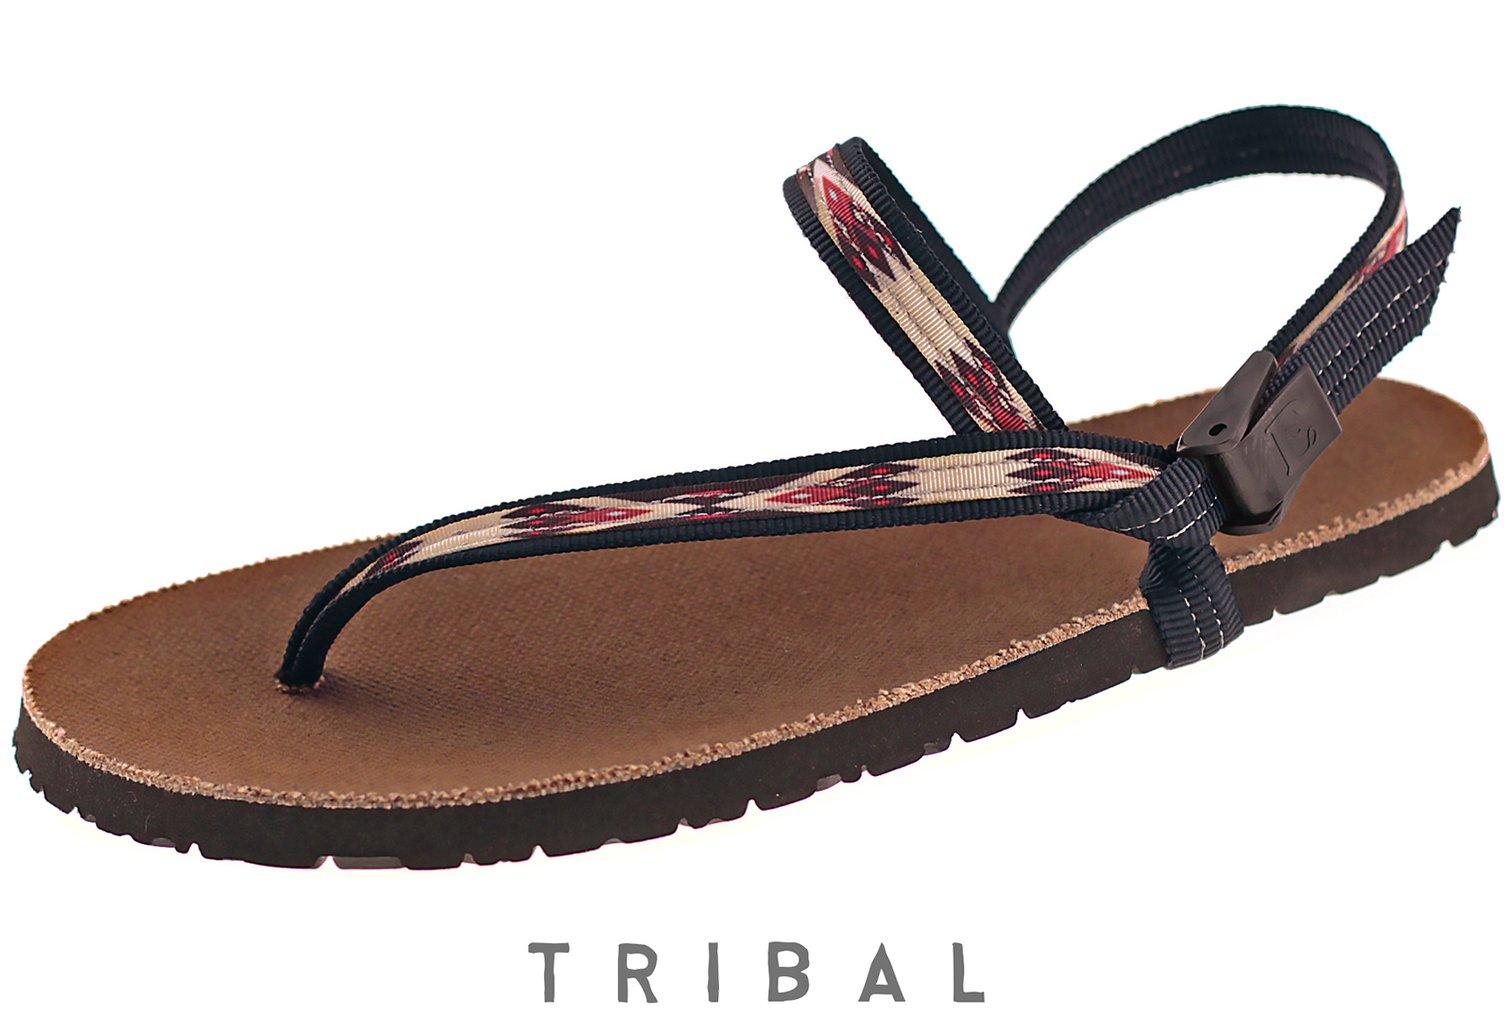 Alpha Lifestyle Sandals Picture 1